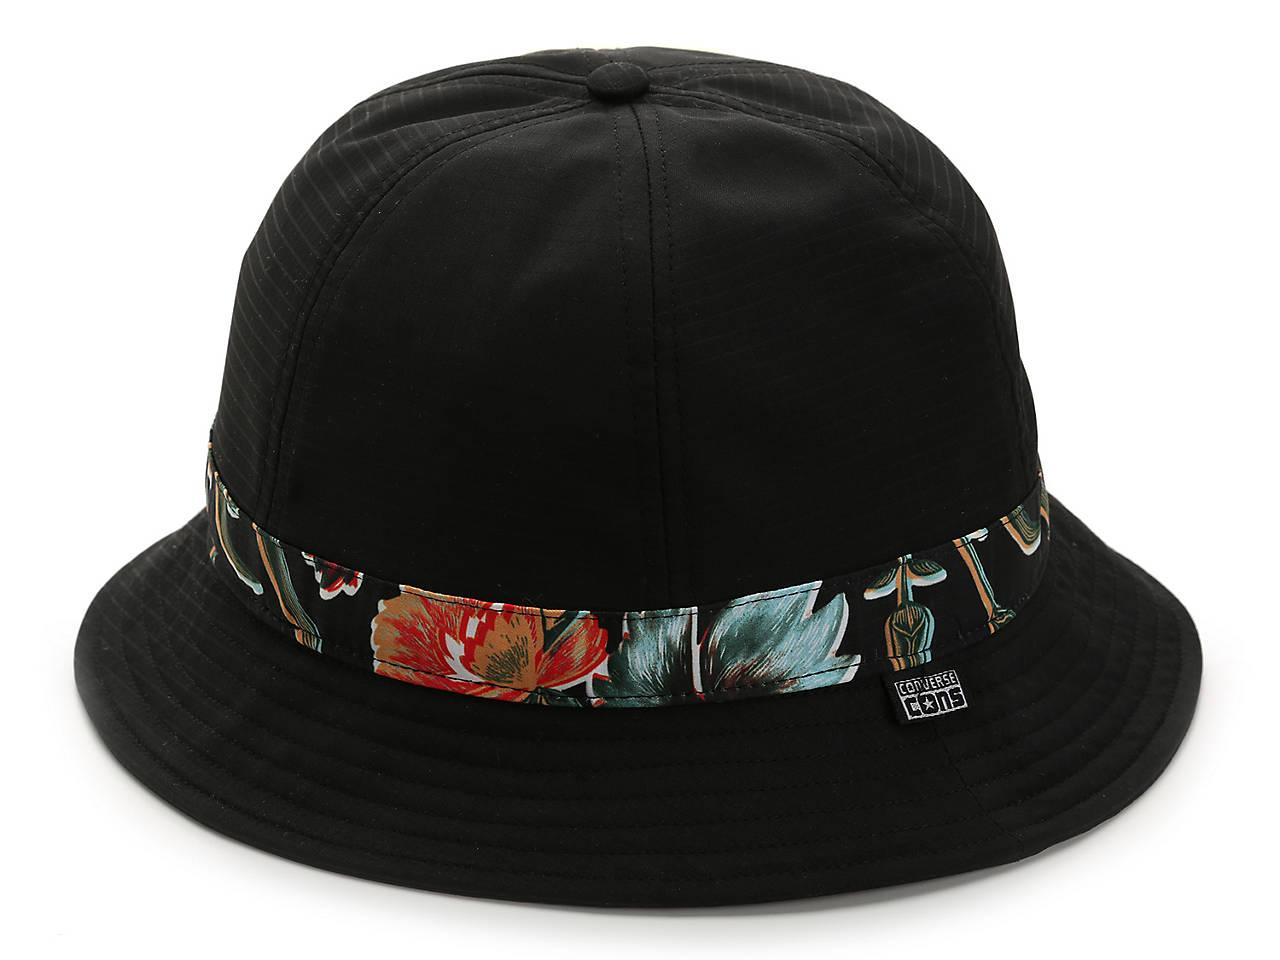 Converse Floral Band Bucket Hat Men s Handbags   Accessories  cf4c5779540